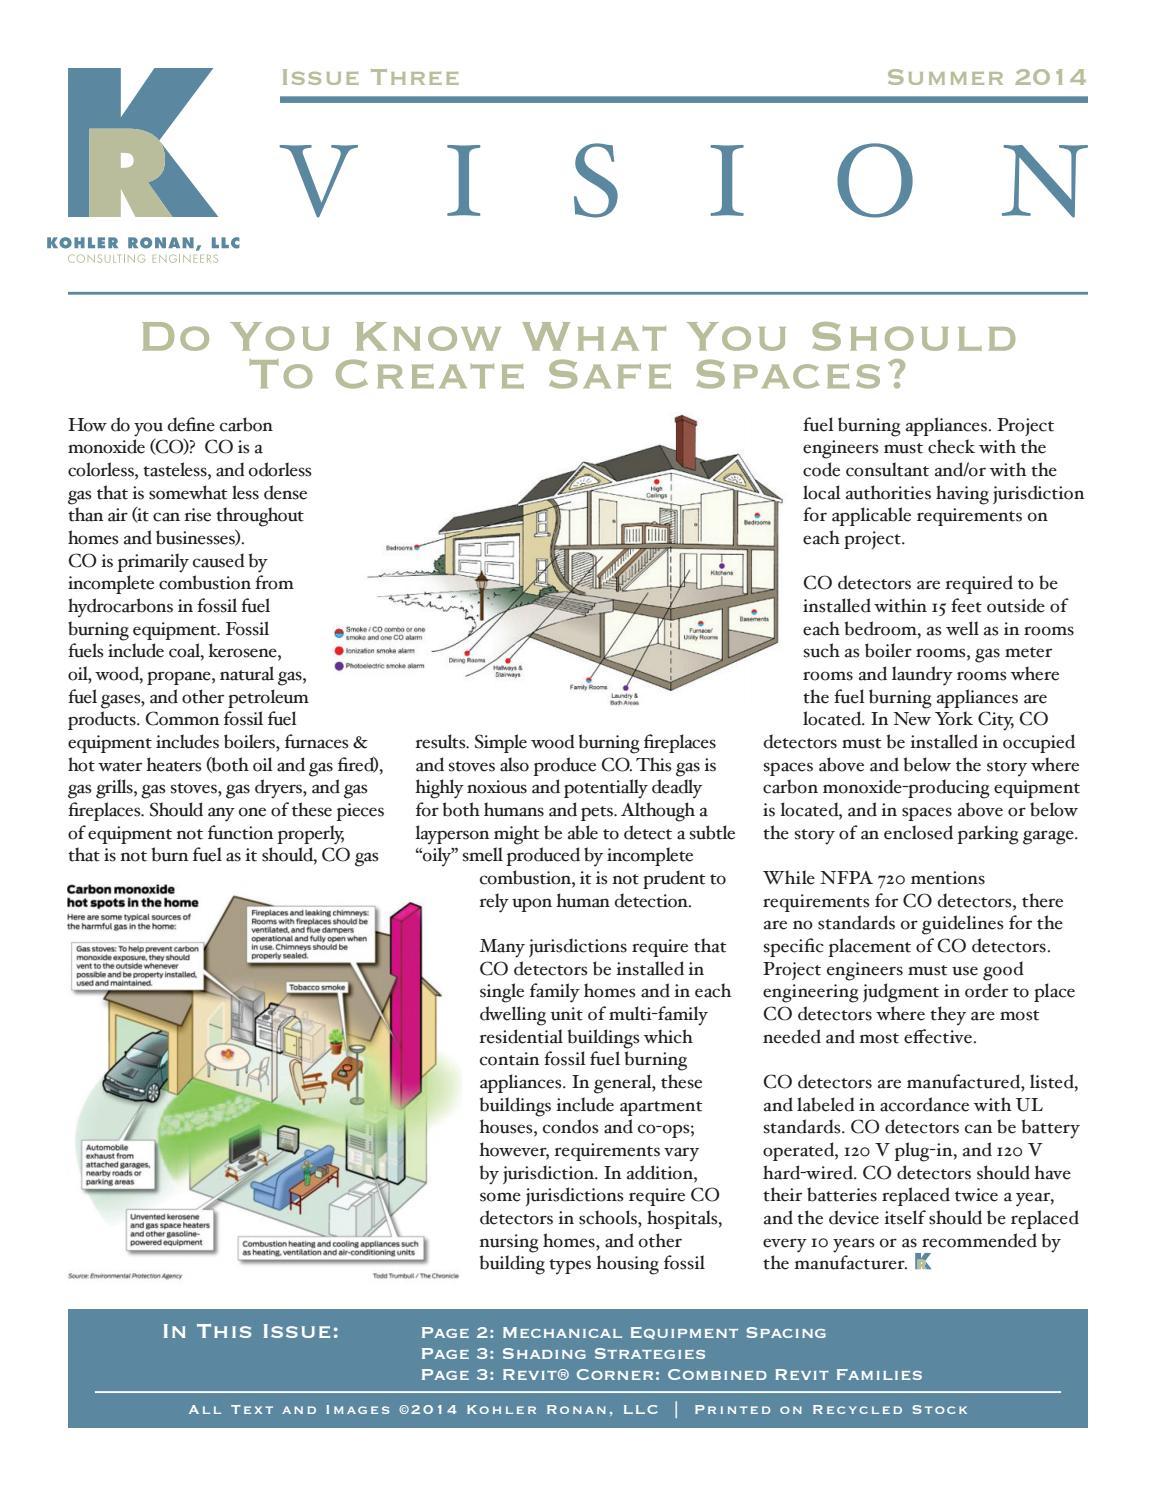 Kohler Ronan Consulting Engineers - KR Vision Newsletter - Issue 3